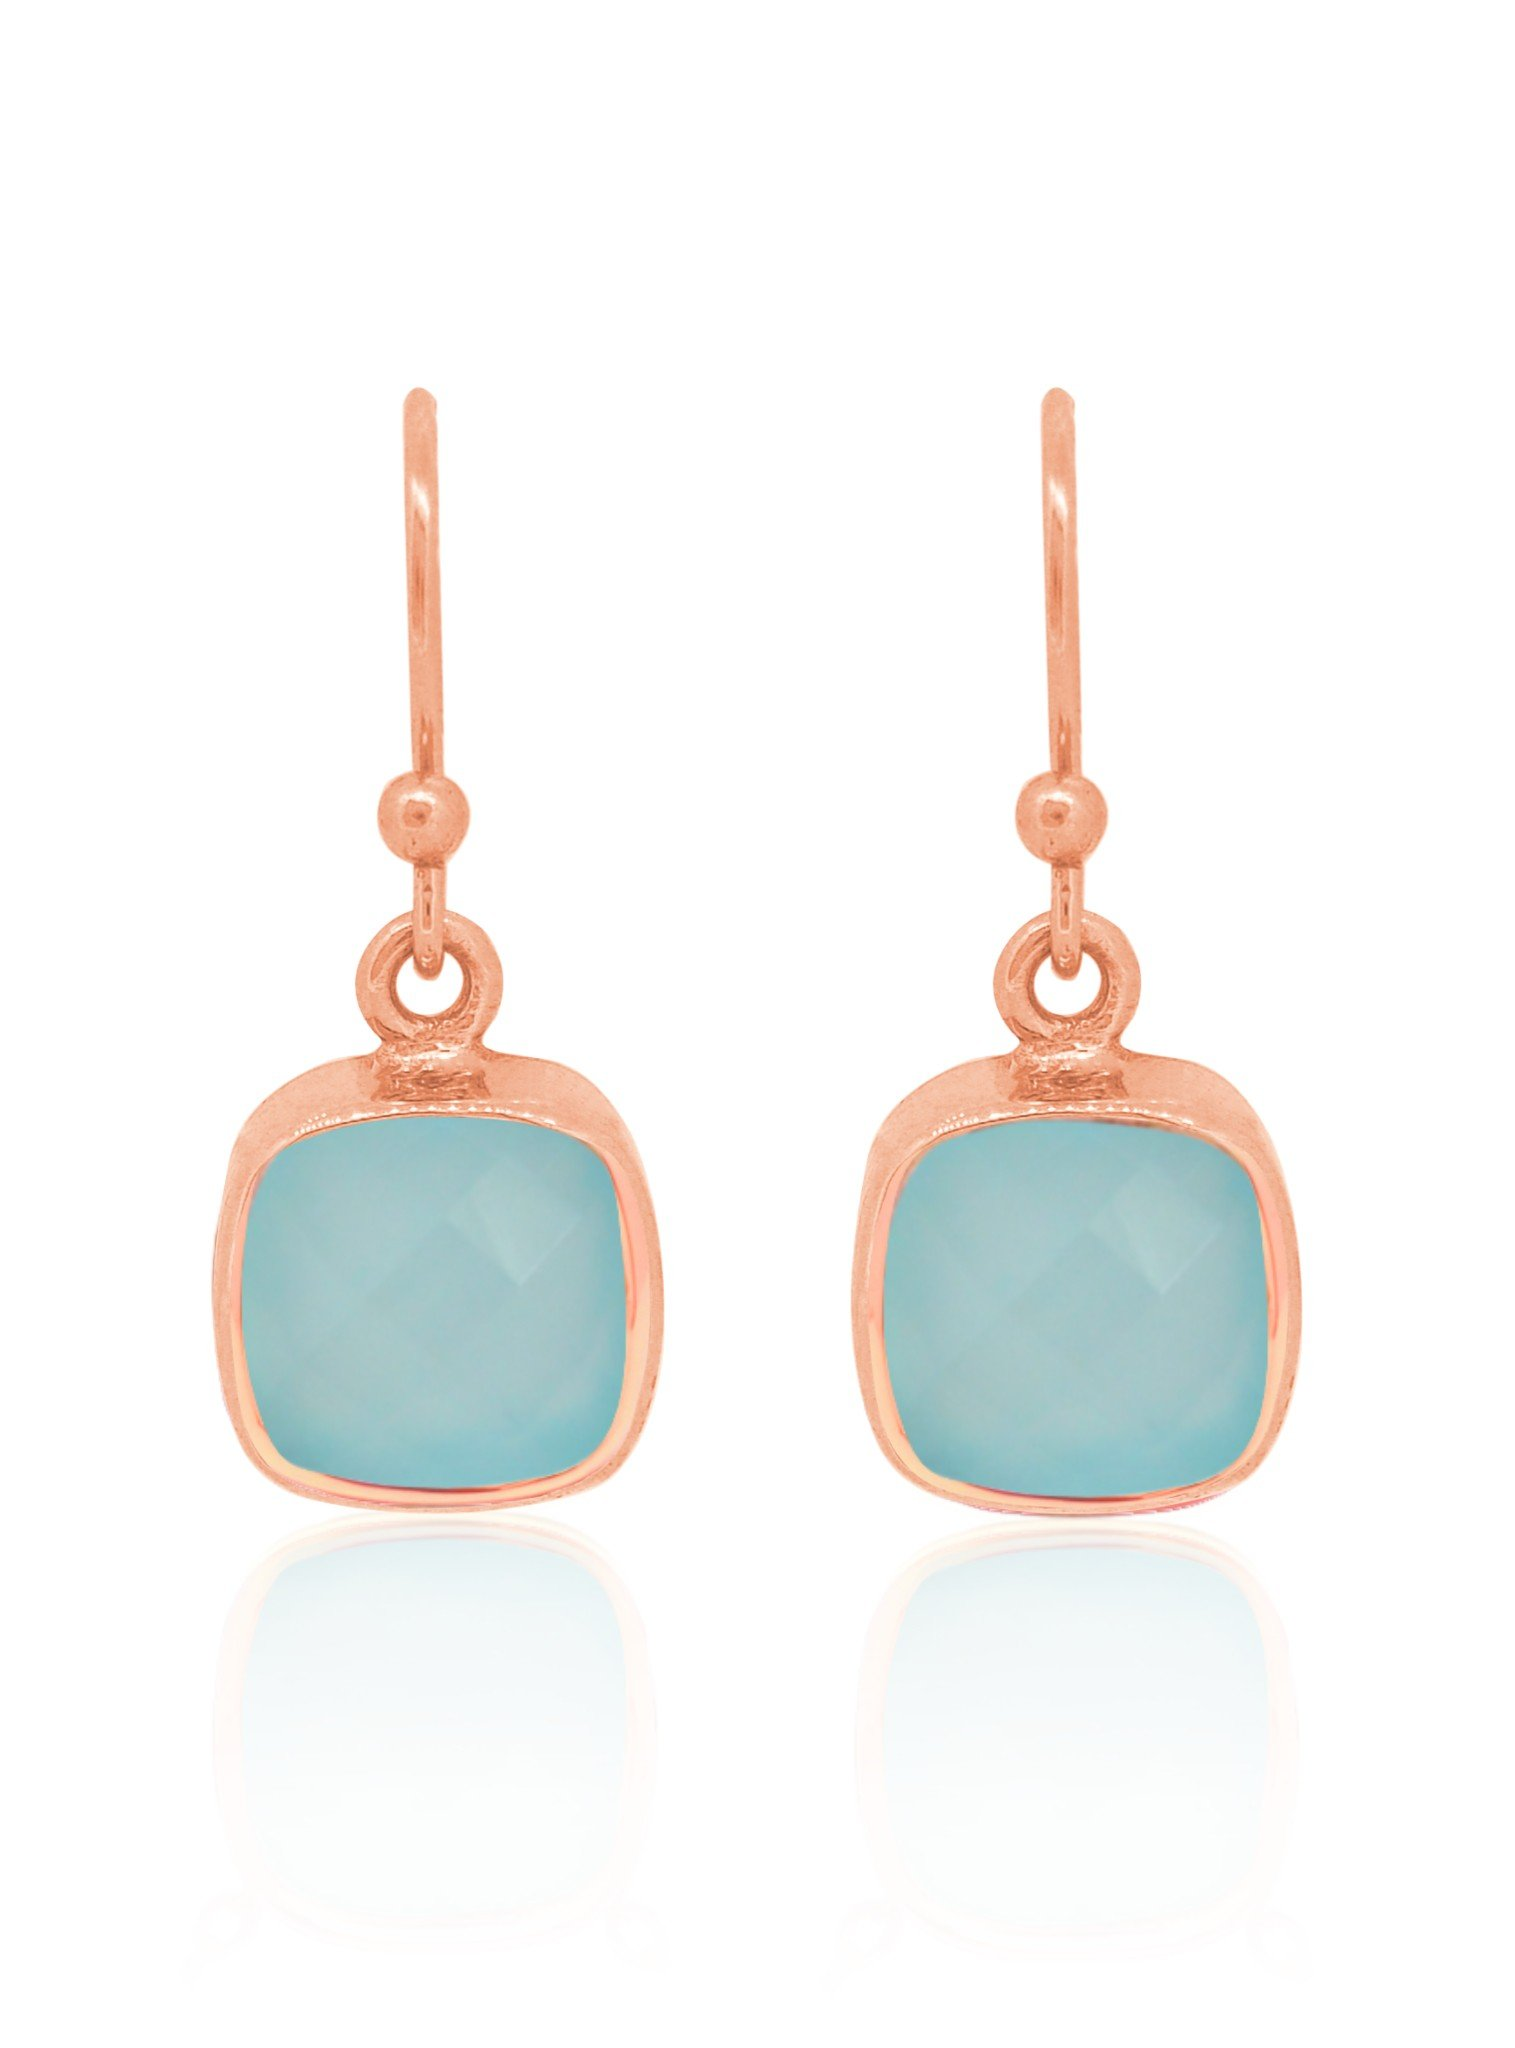 Indie Aqua Chalcedony Gemstone Earrings in Rose Gold